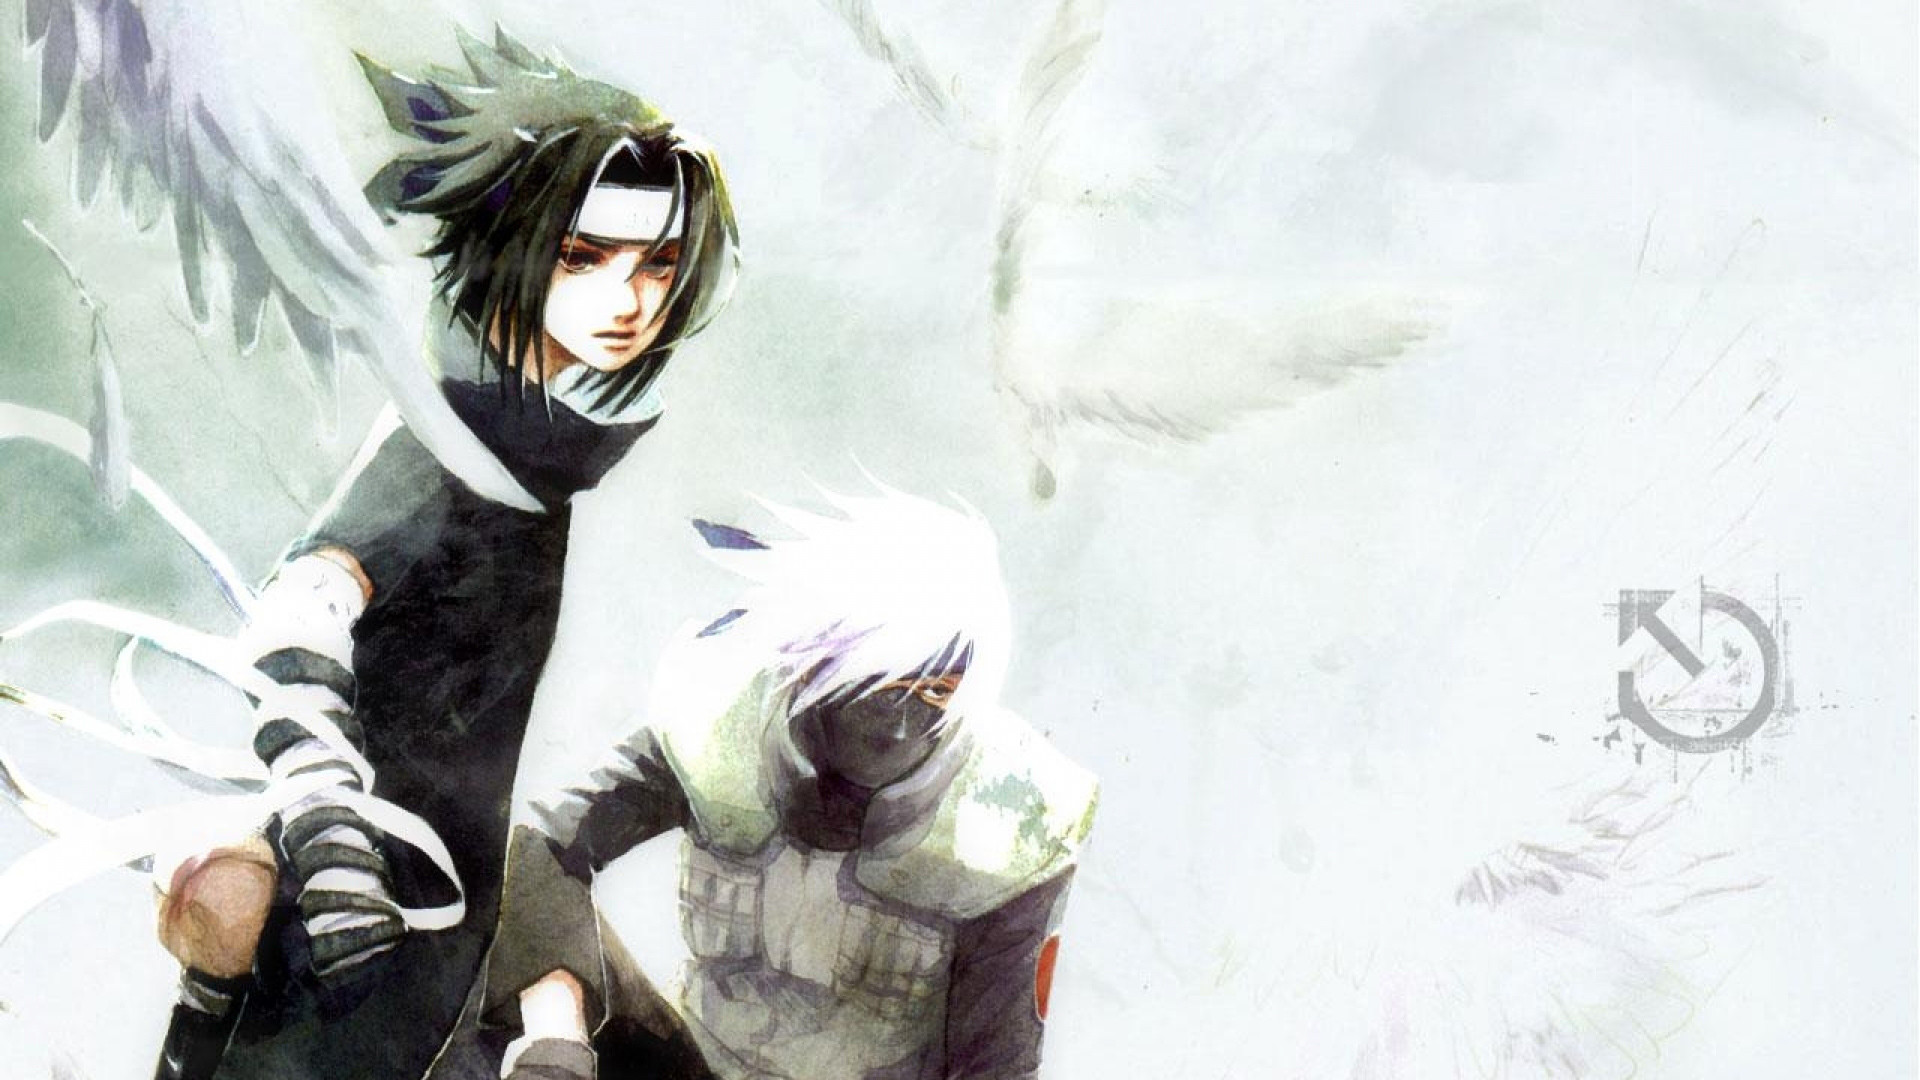 Anime   Full HD Wallpapers, download 1080p desktop backgrounds